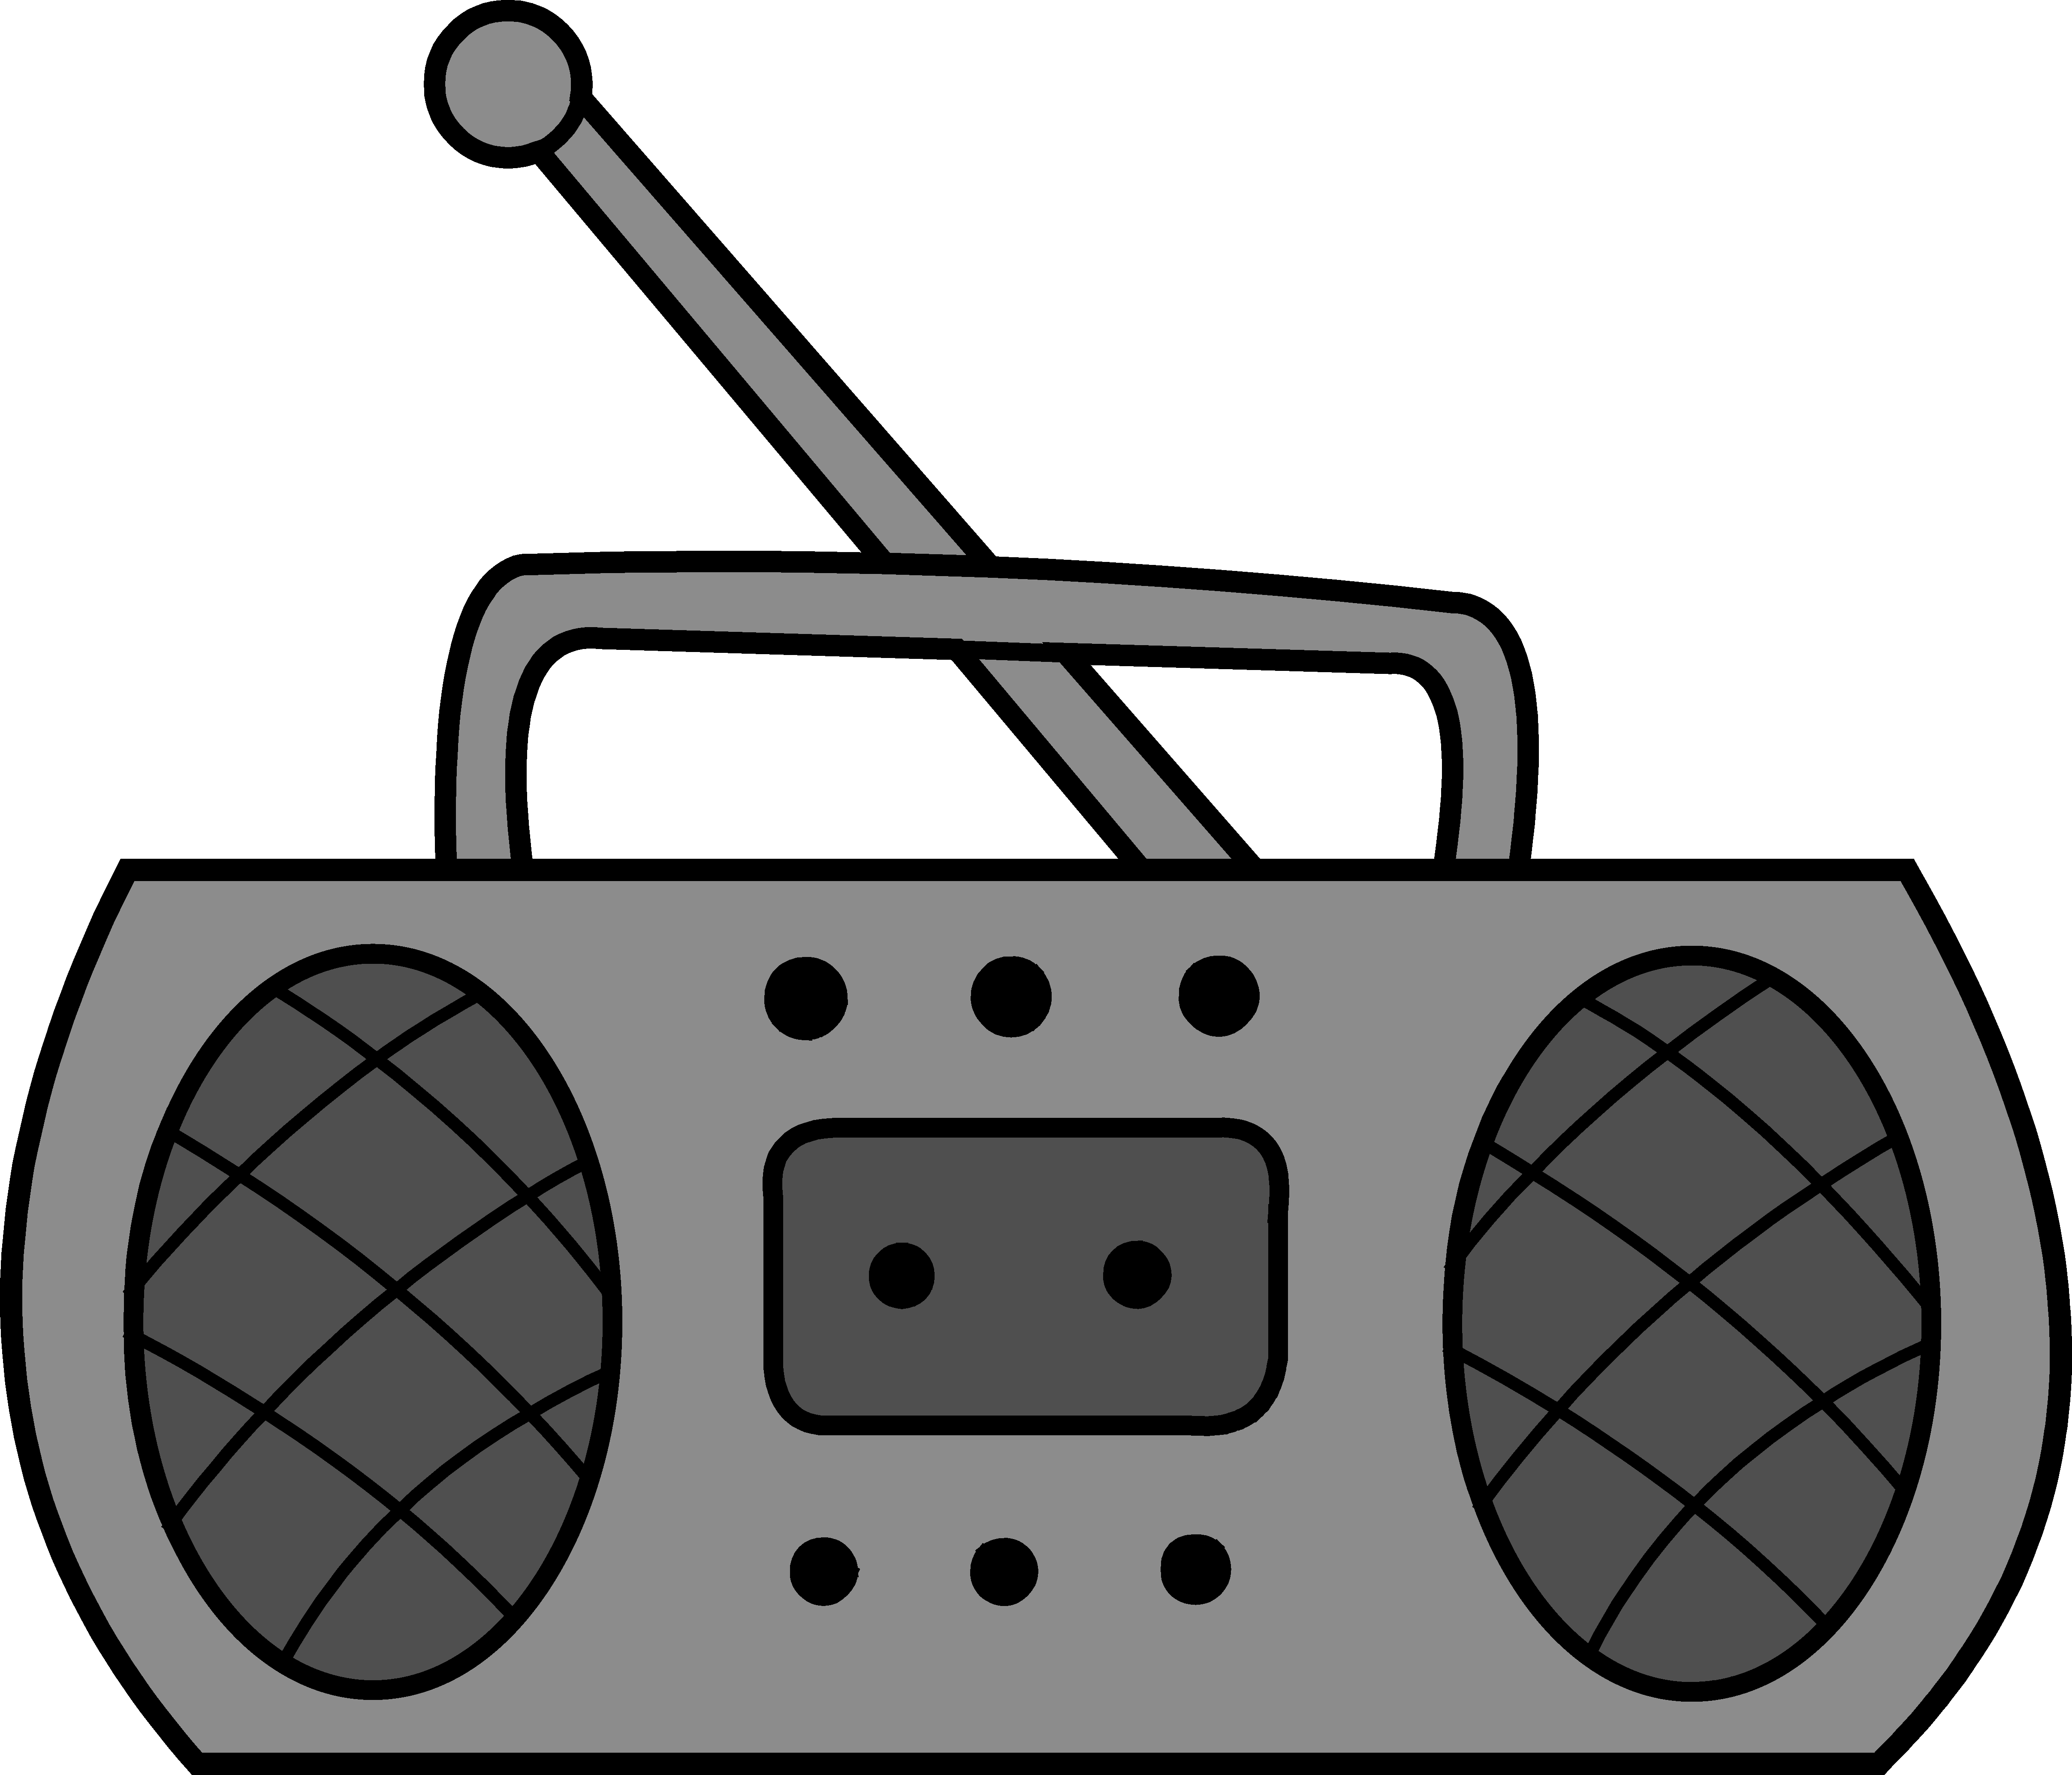 Boombox clipart simple. Cute radio design free